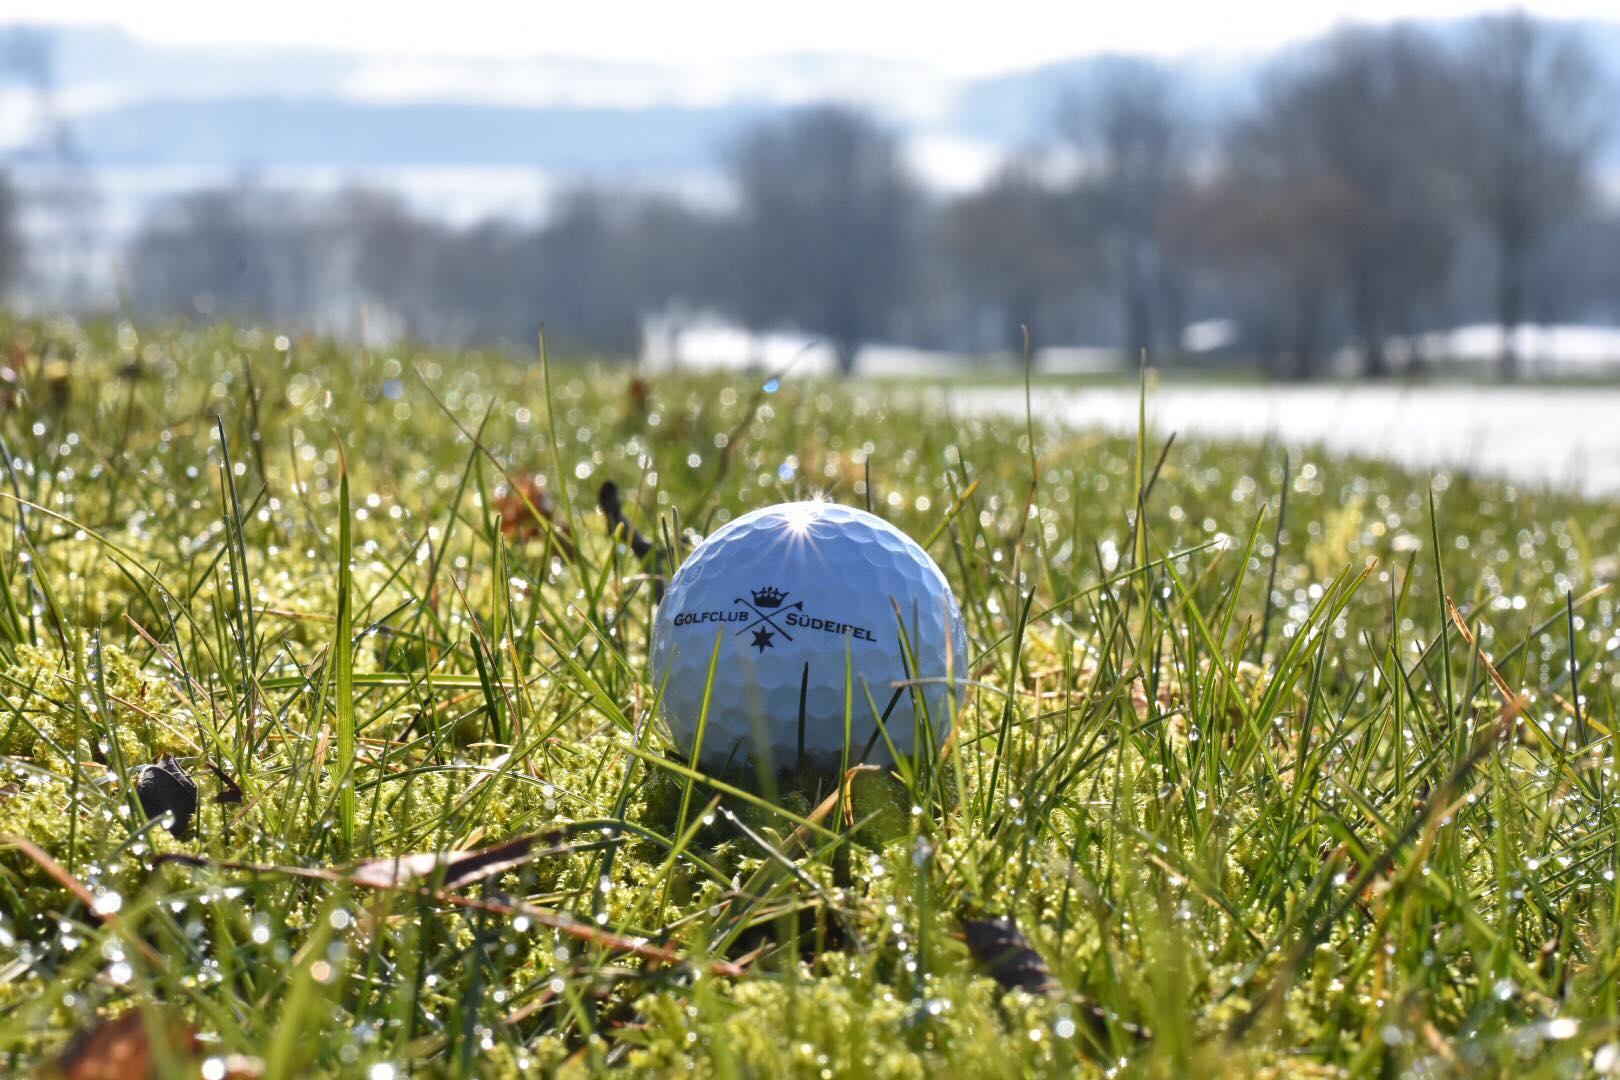 Golfclub Südeifel Angebot 2018